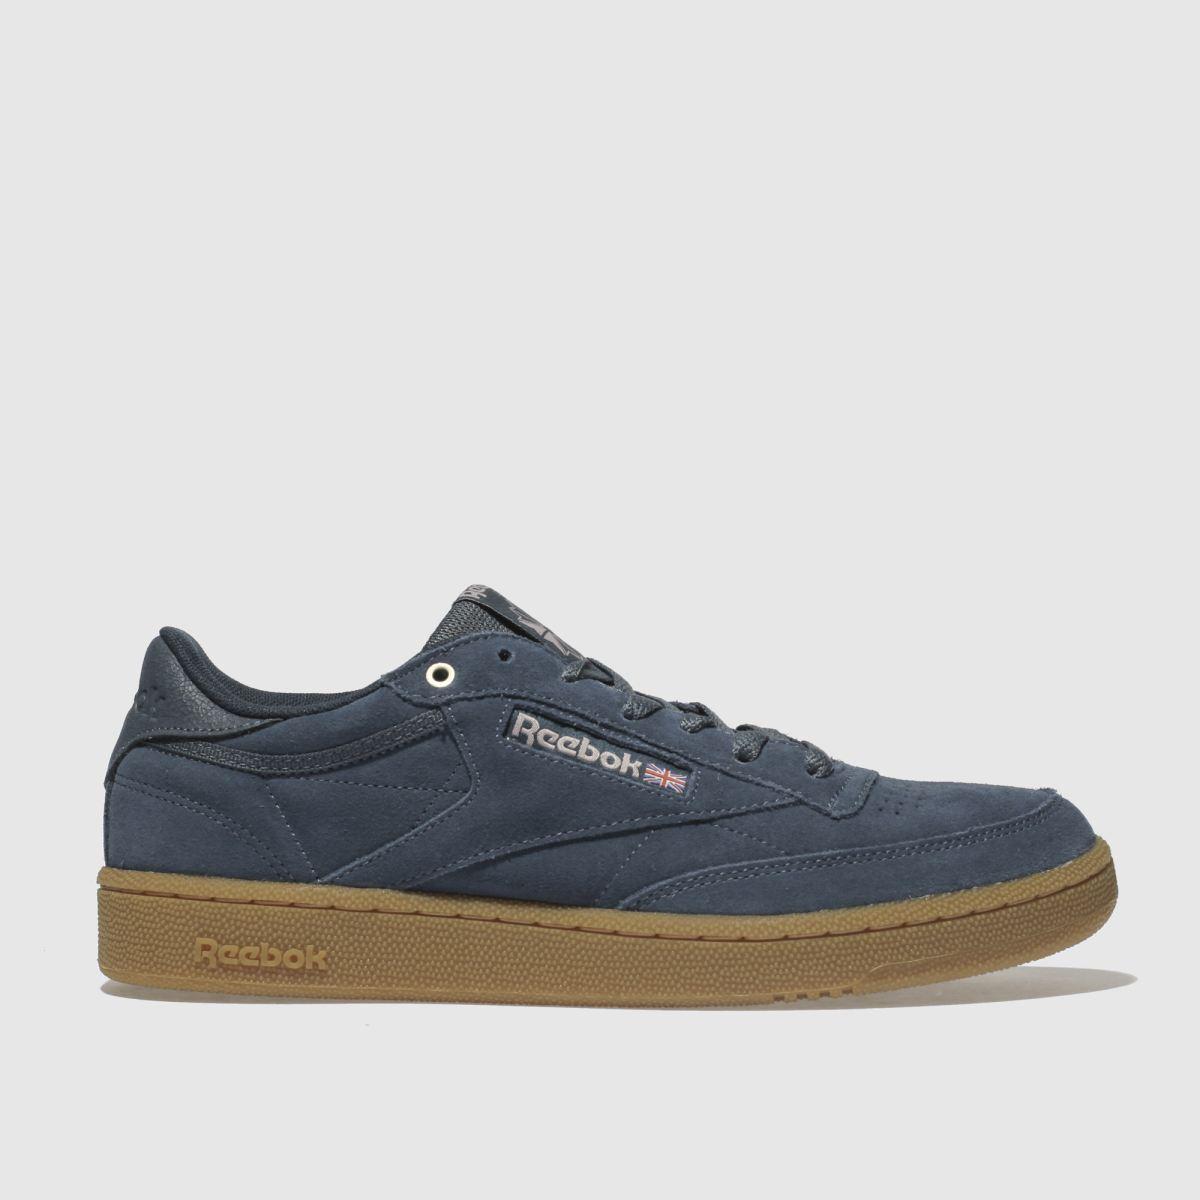 7a85b59b3c034d Reebok Blue Club C 85 Trainers - Schuh at Westquay - Shop Online